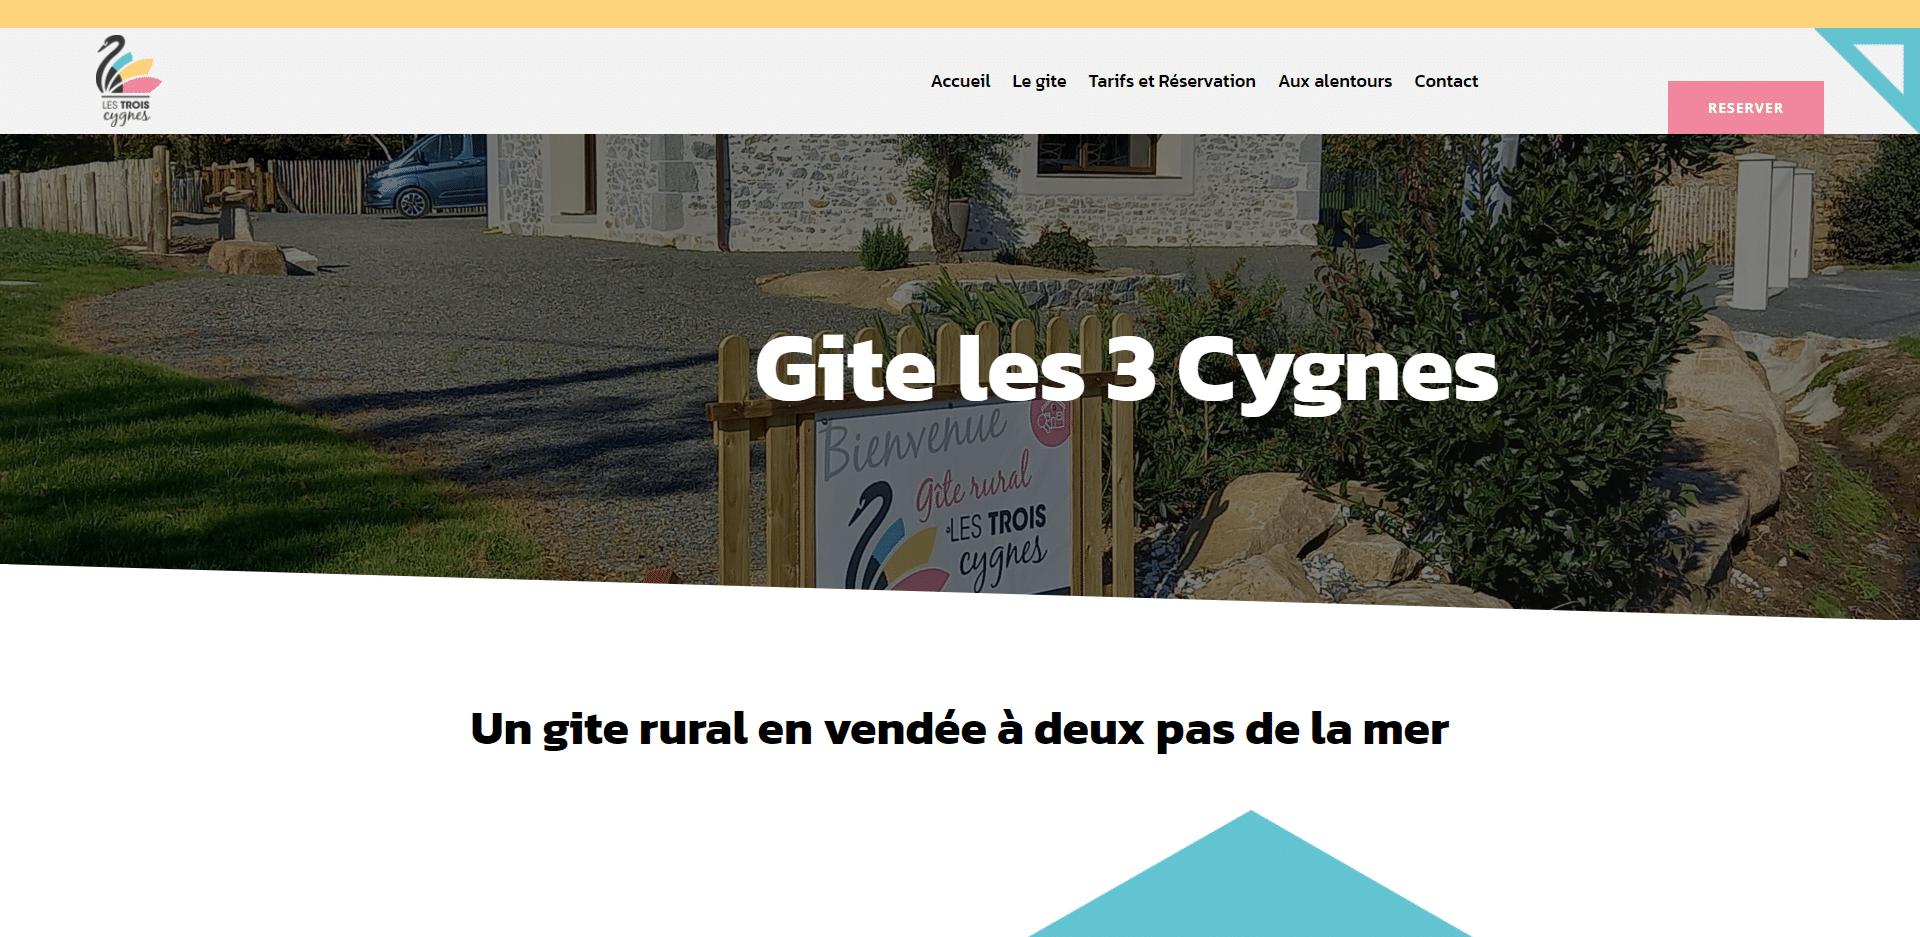 Gite Les 3 Cygnes